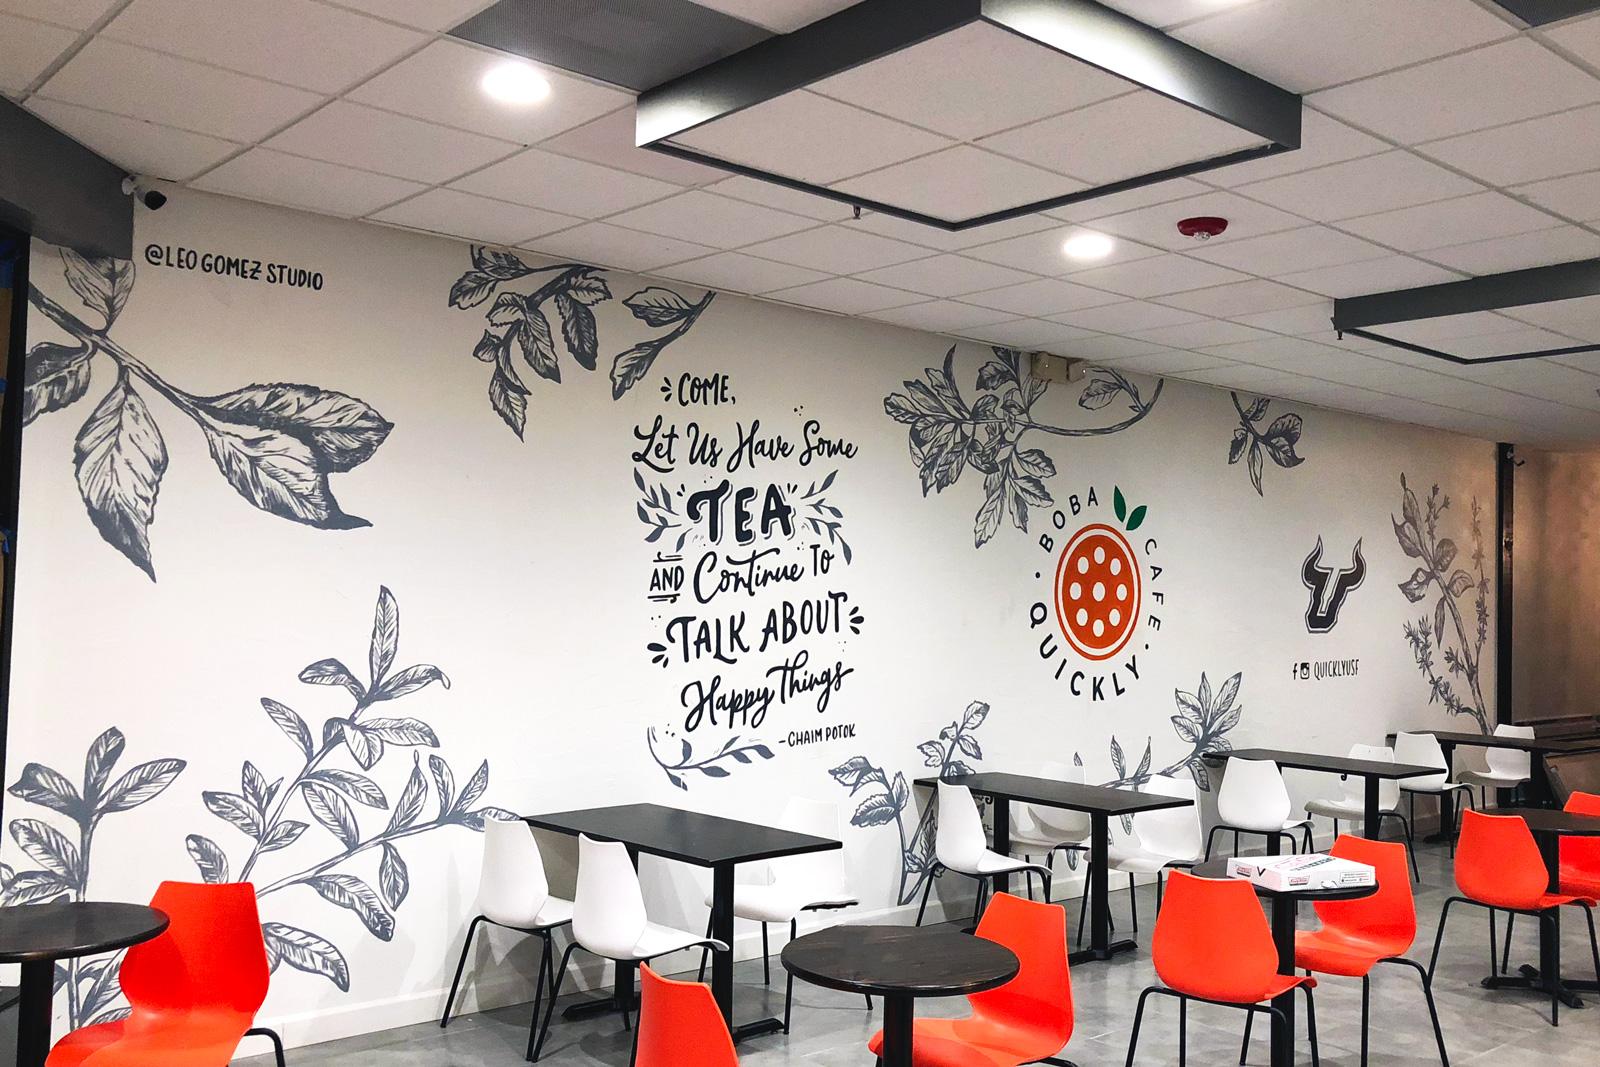 Quickly-leo-gomez-studio-mural-full.jpg